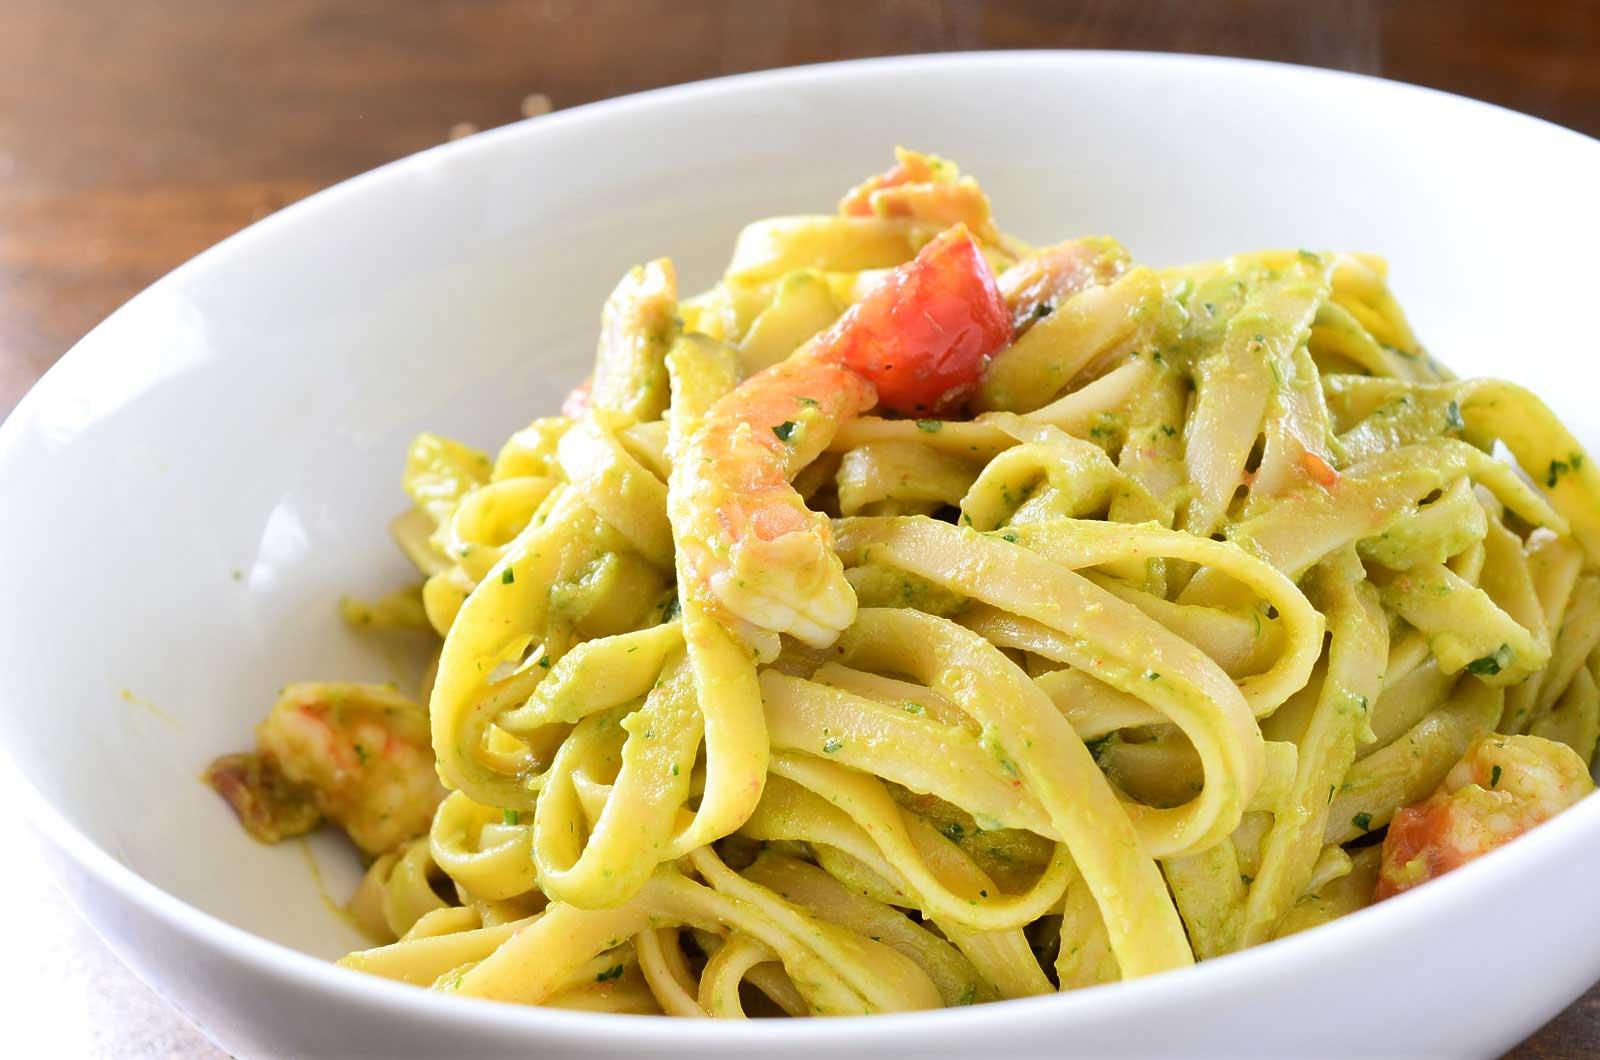 Recipe for Creamy Avocado Pasta with Shrimp and Bacon - Life's ...